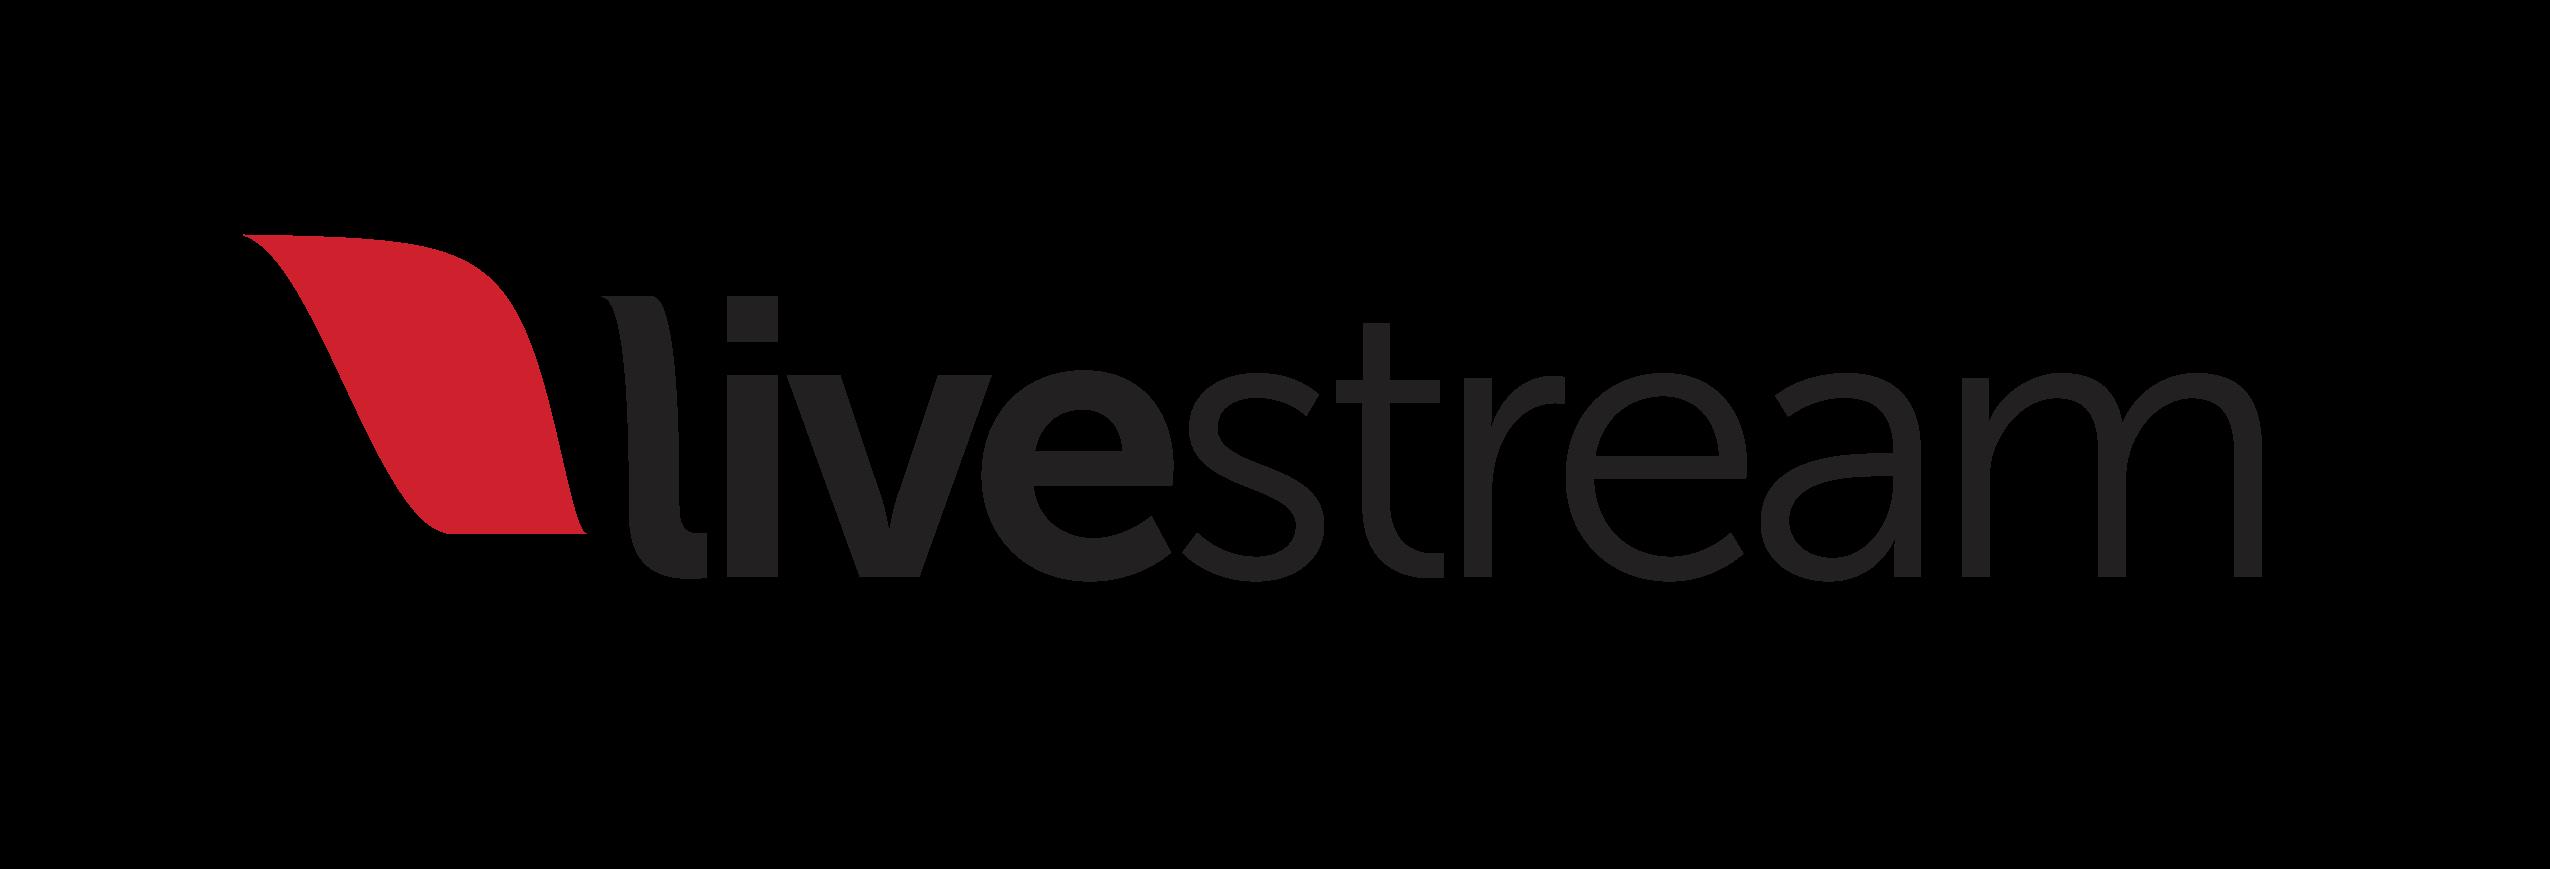 LiveStream webinar